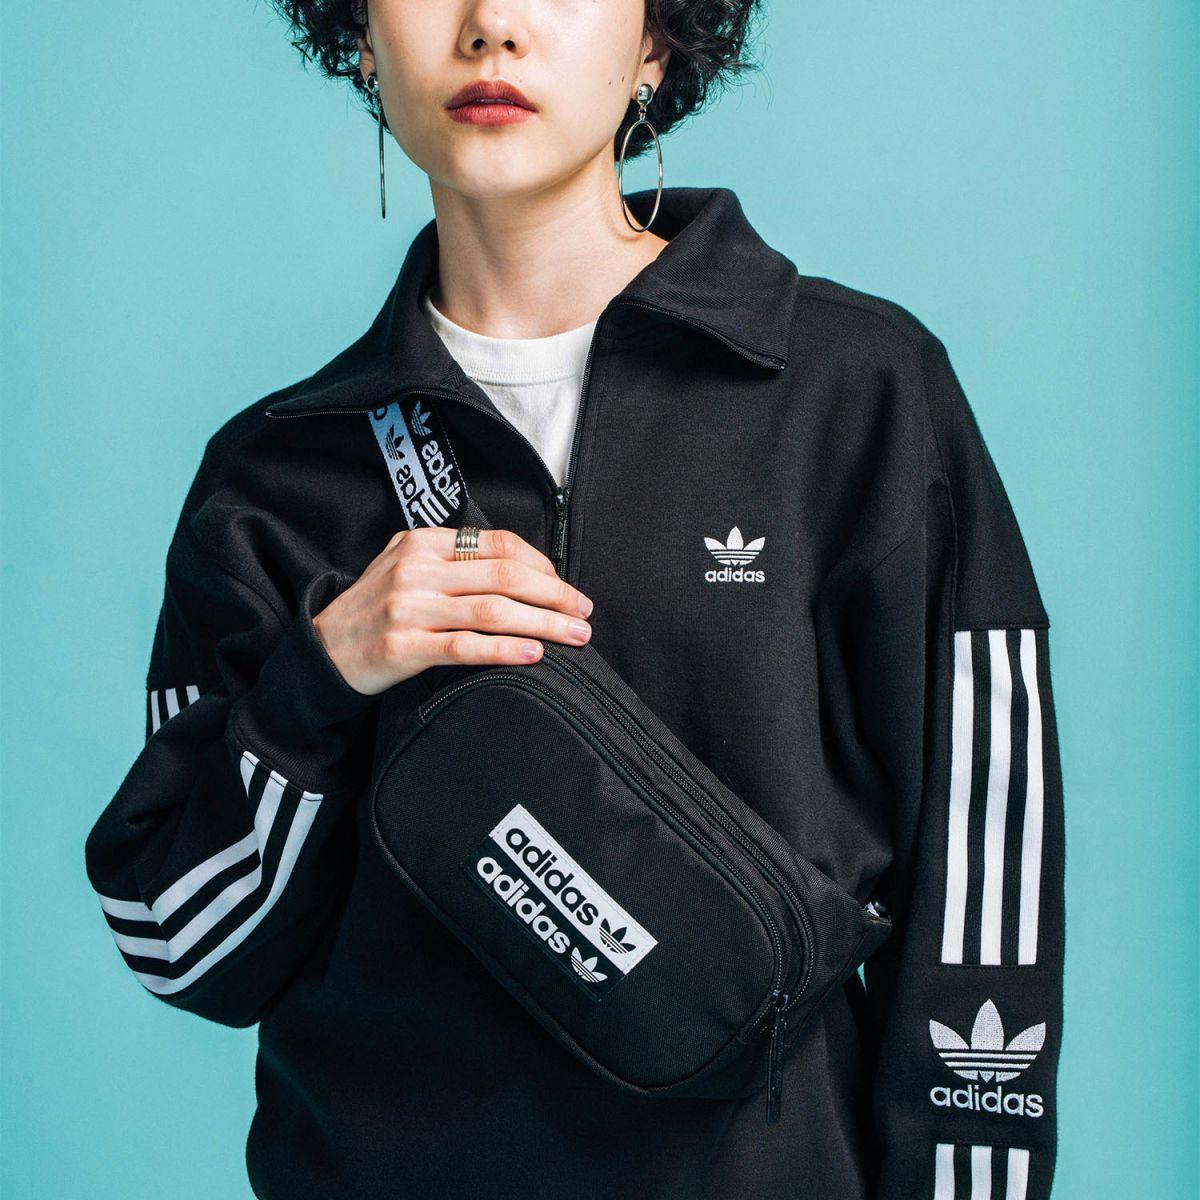 Adidas adidas LOCK UP SWEATSHIRT Lady's originalsware tops sweat shirt ED7526 fw2019_eoss